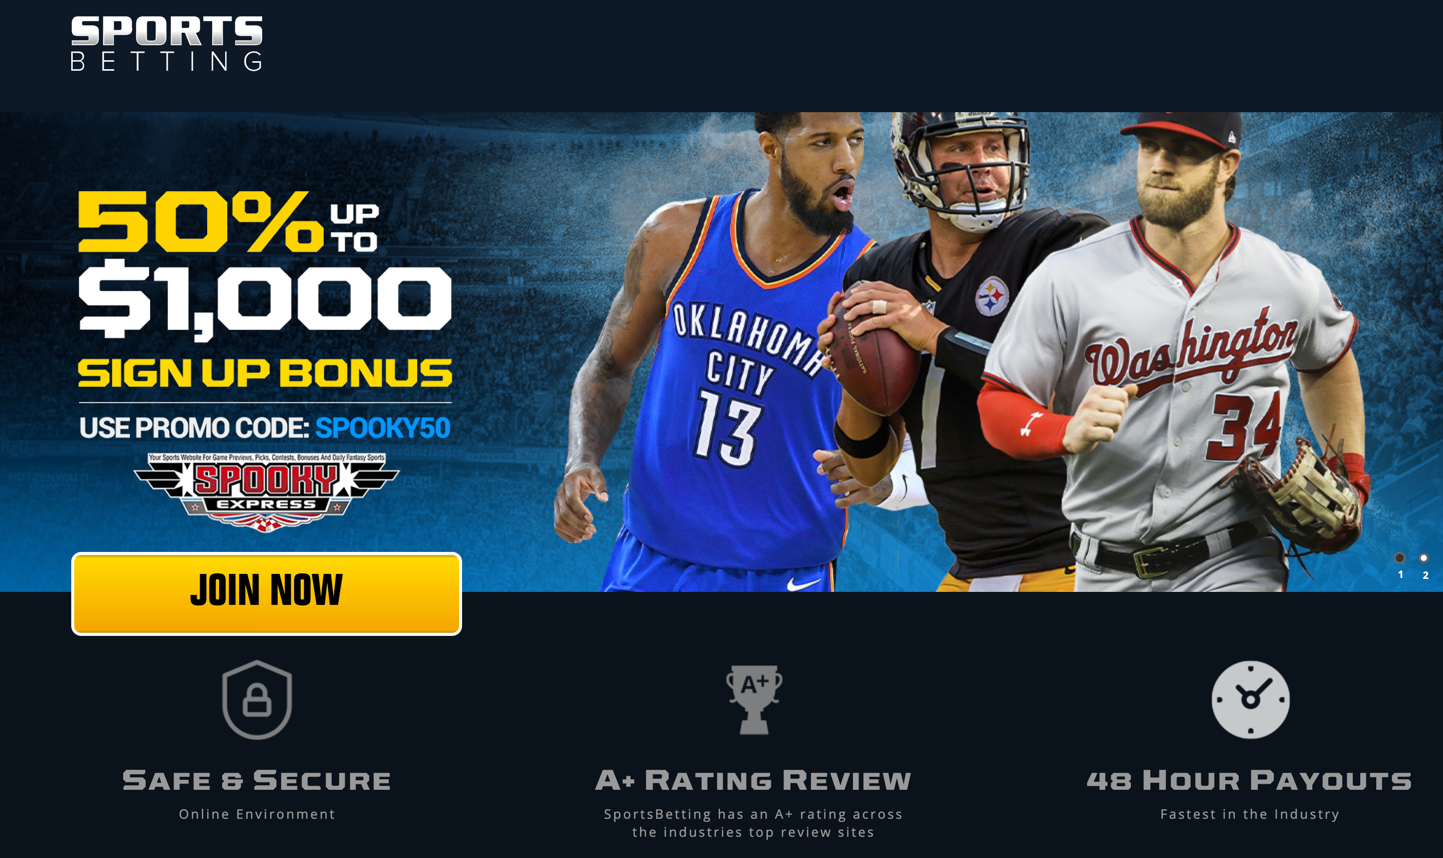 Sports betting sportsbook review best binary options trading platform 2021 nissan